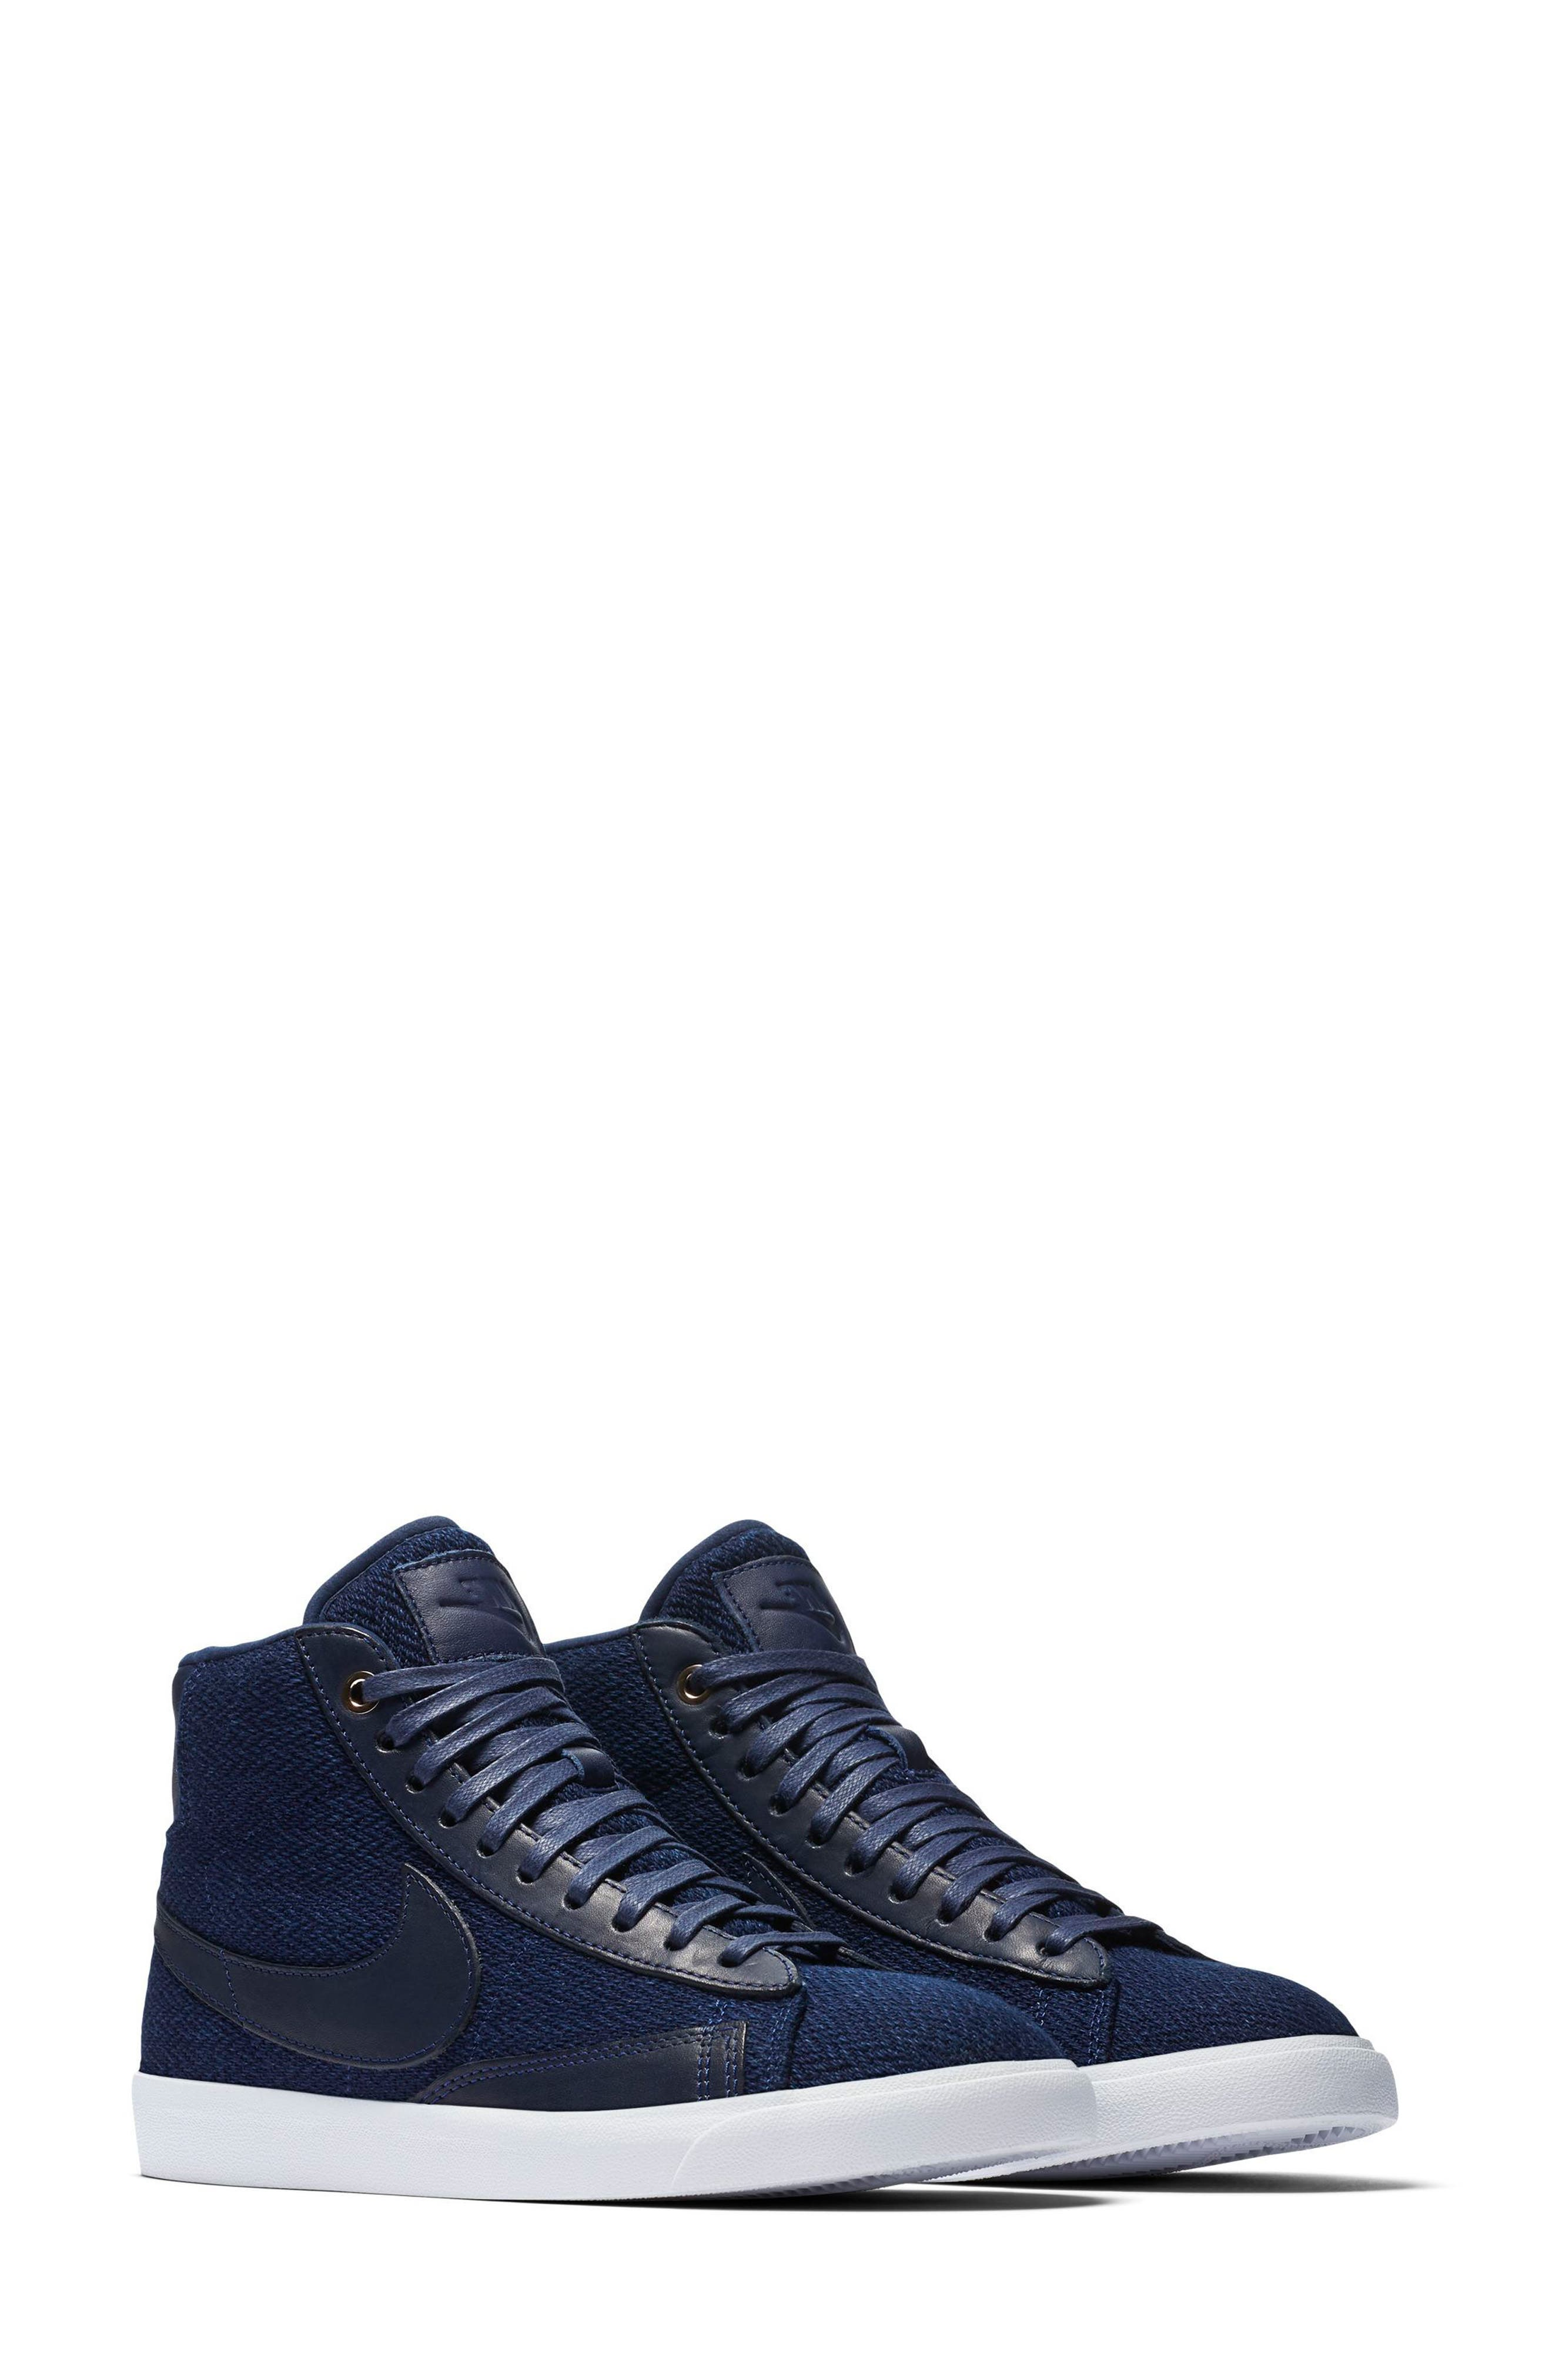 Nike Blazer Mid Premium LX Sneaker (Women)